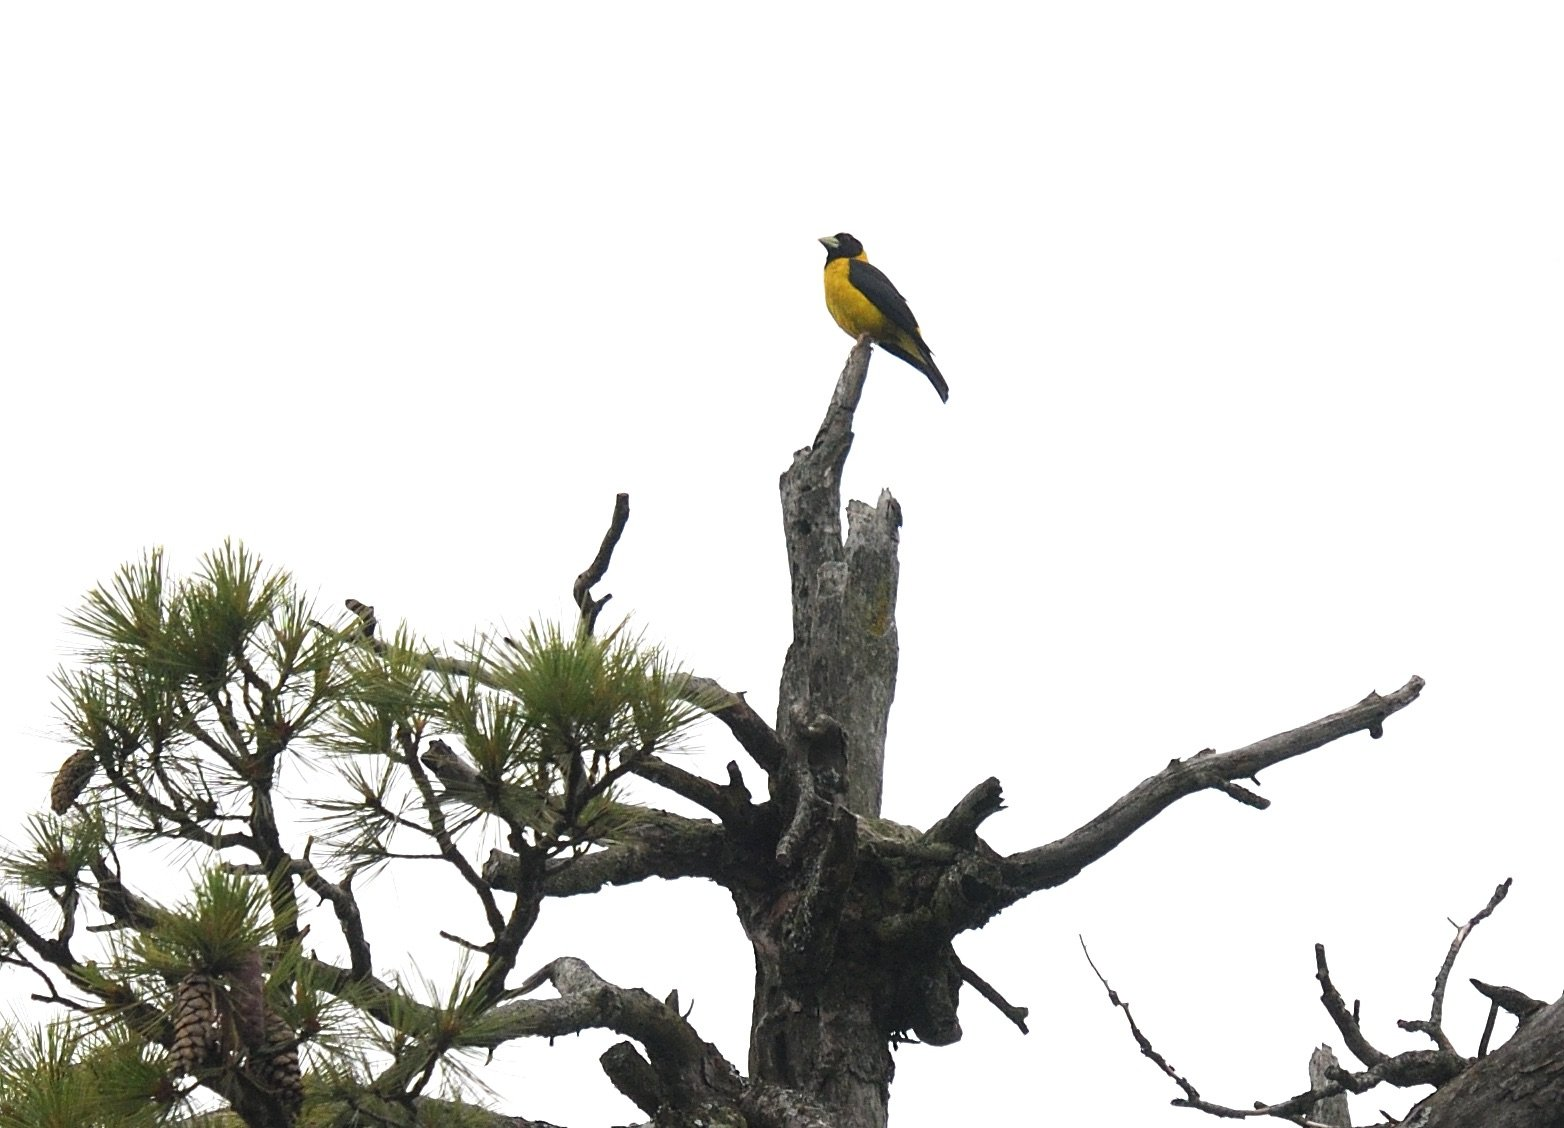 Black-and-yellow Grosbeak